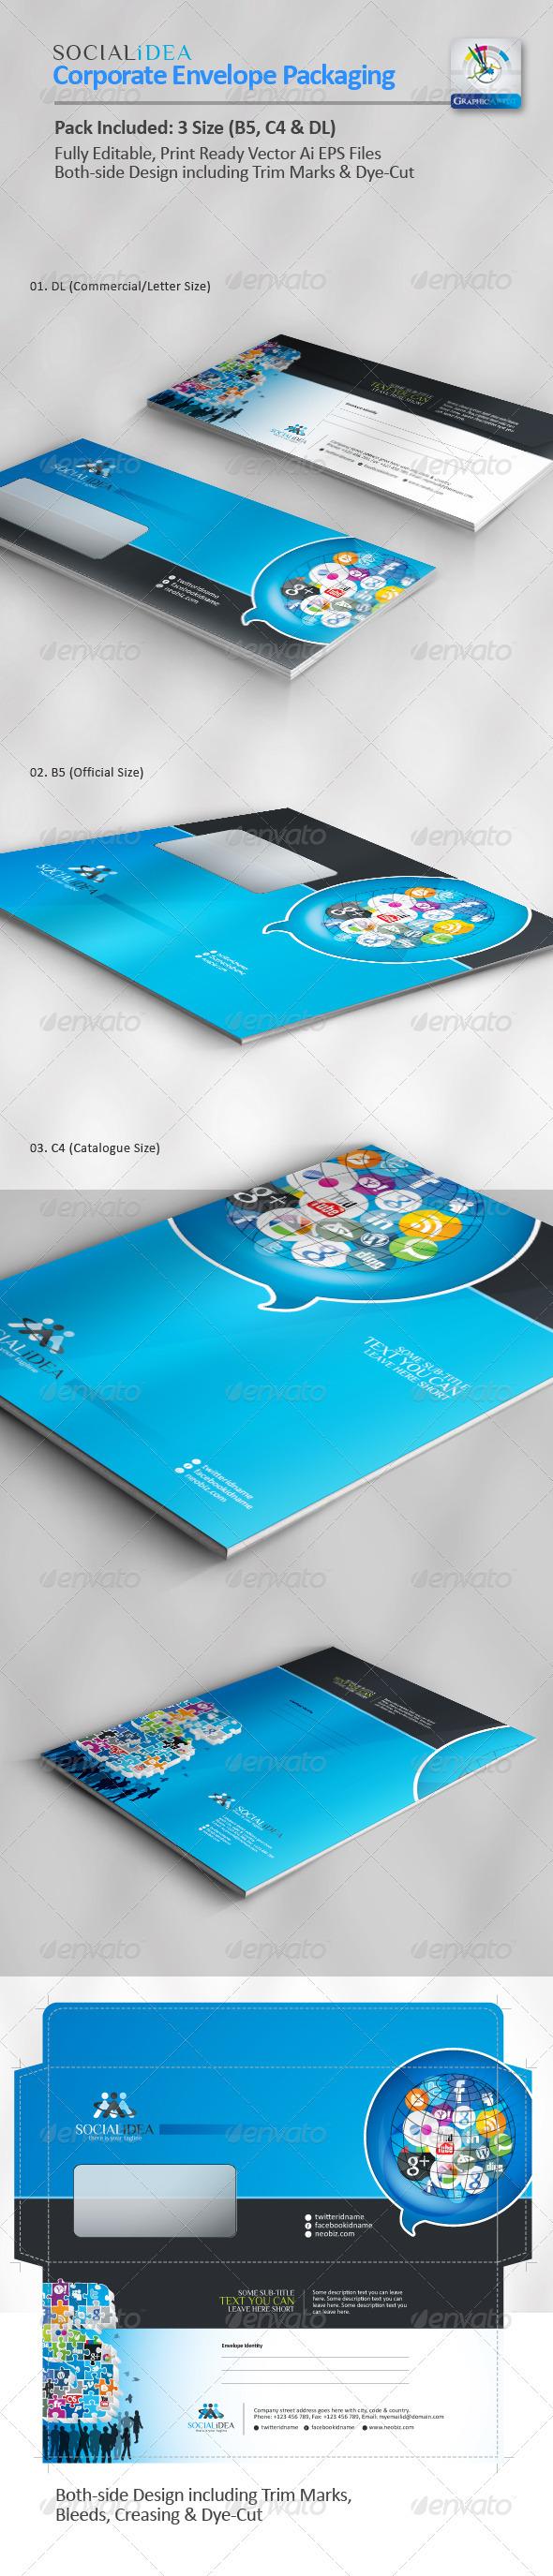 Socialidea Corporate Social Media Envelope Pack - Packaging Print Templates